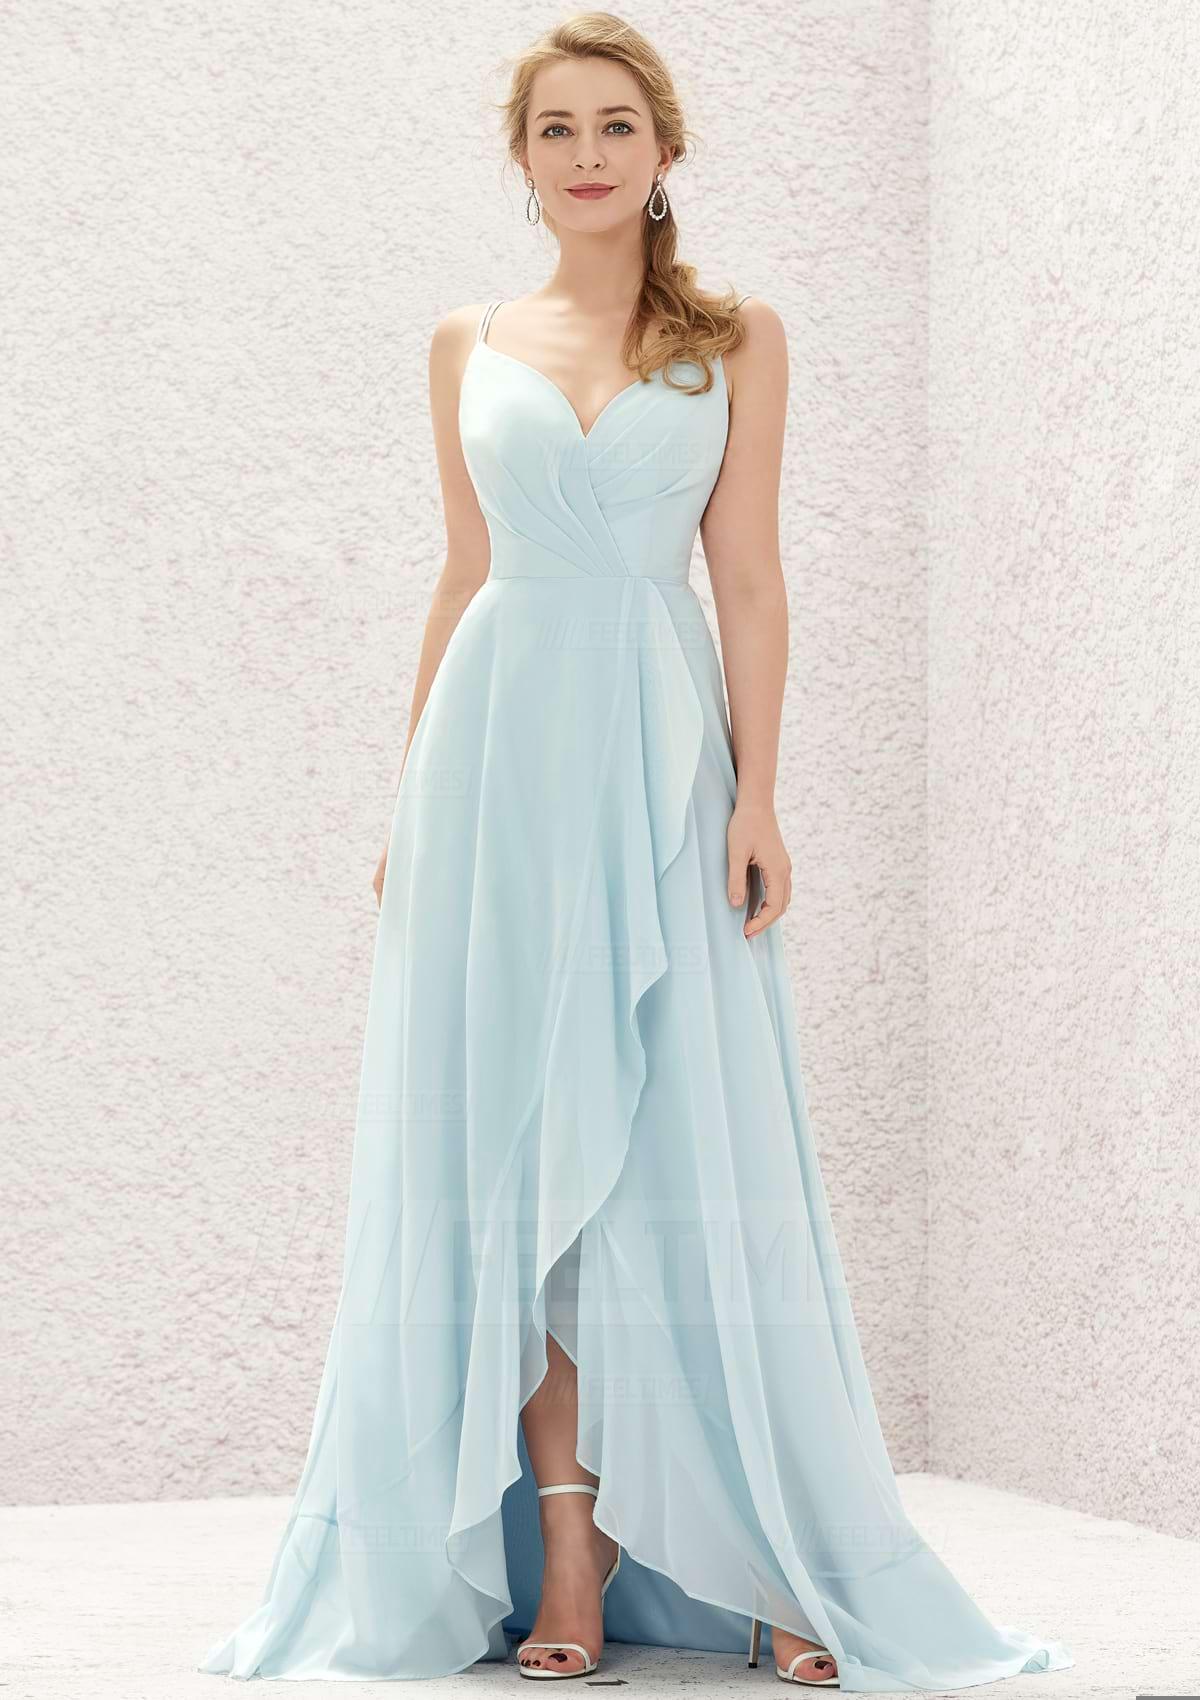 A-line/Princess Sleeveless Asymmetrical Chiffon Bridesmaid Dresses With Cascading/Ruffles/Pleated